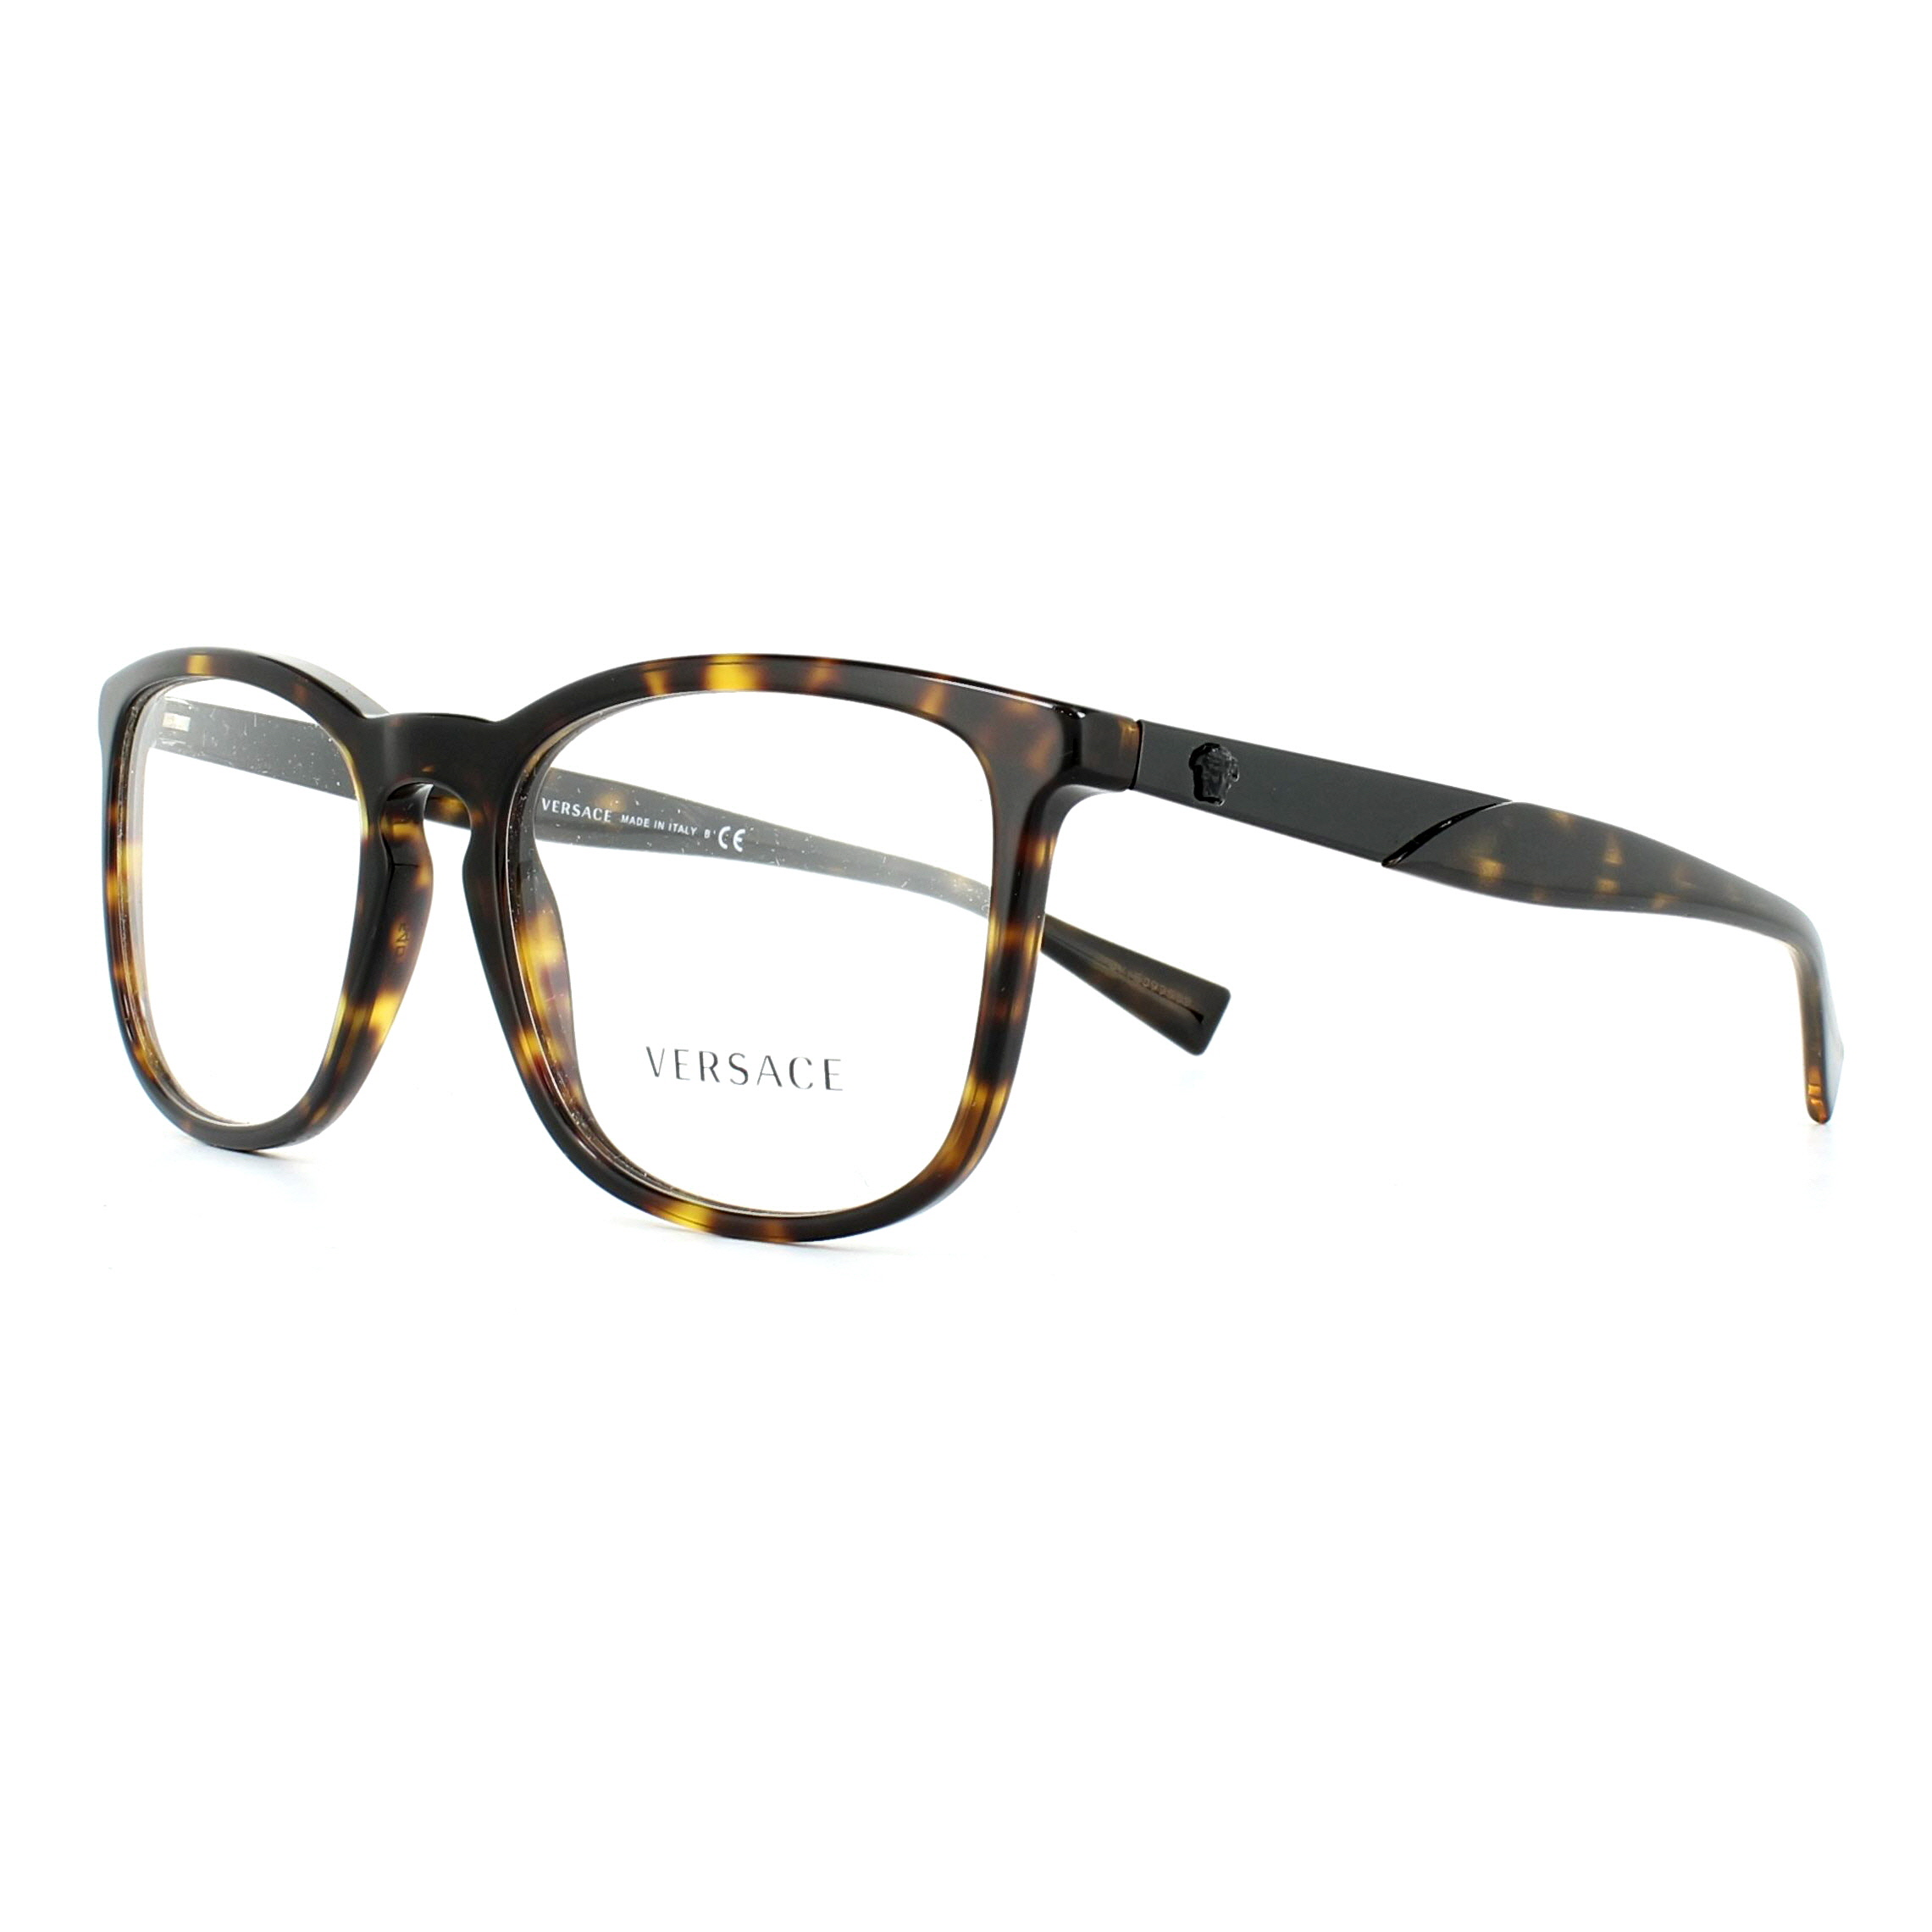 Versace Glasses Frames 3252 108 Dark Havana 52mm Mens Womens ...